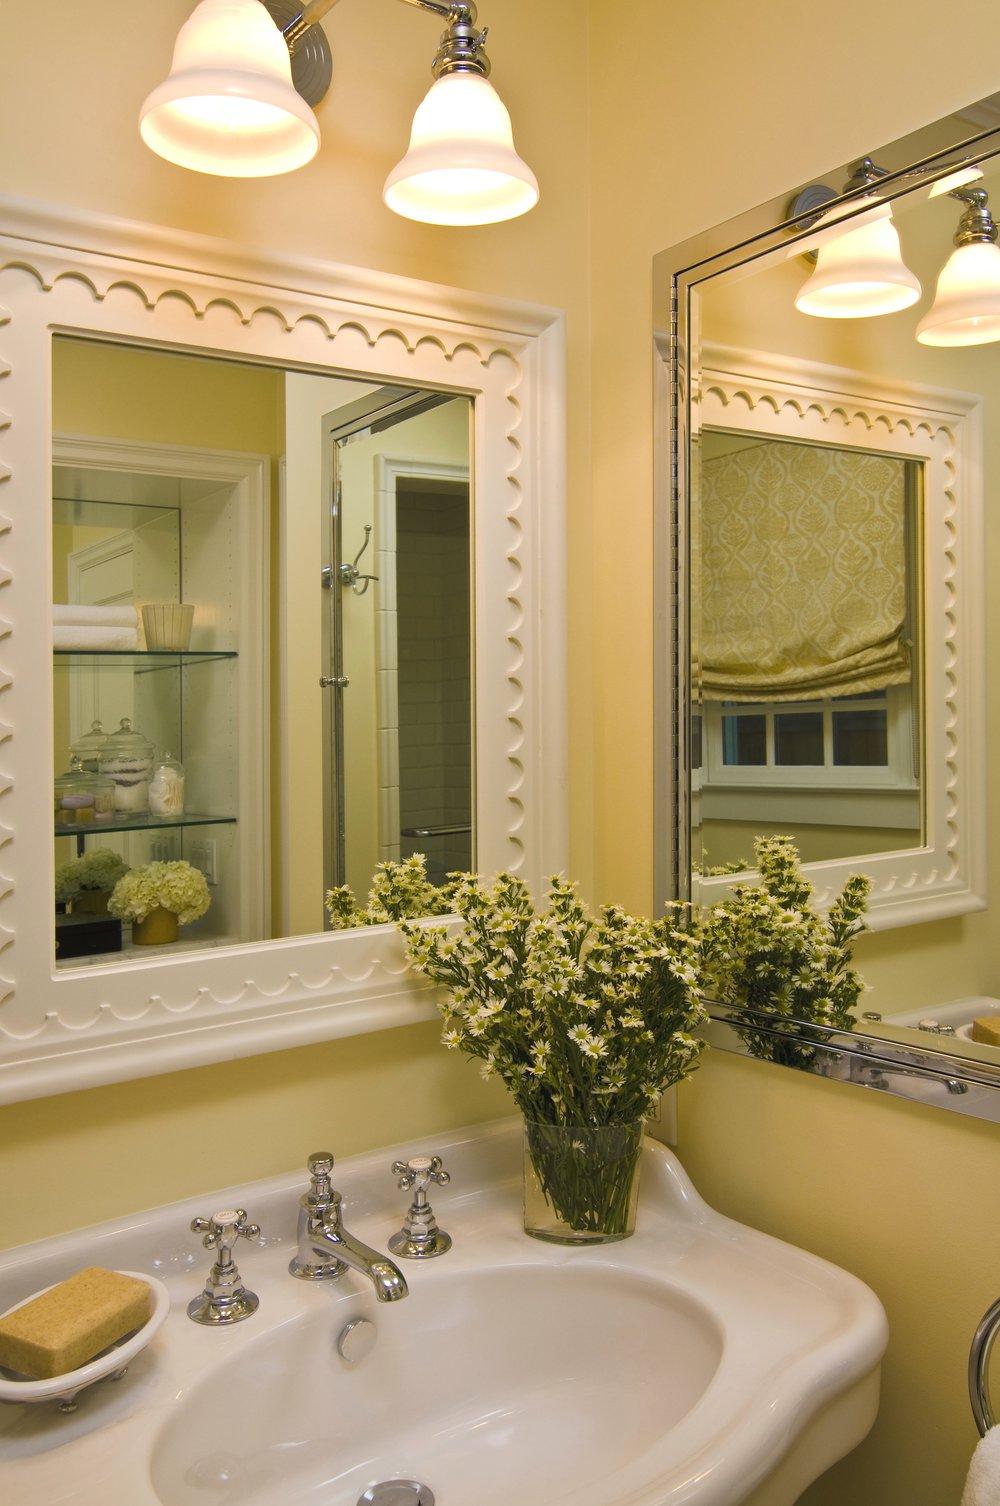 2012-1-6 Bathroom 1.jpg